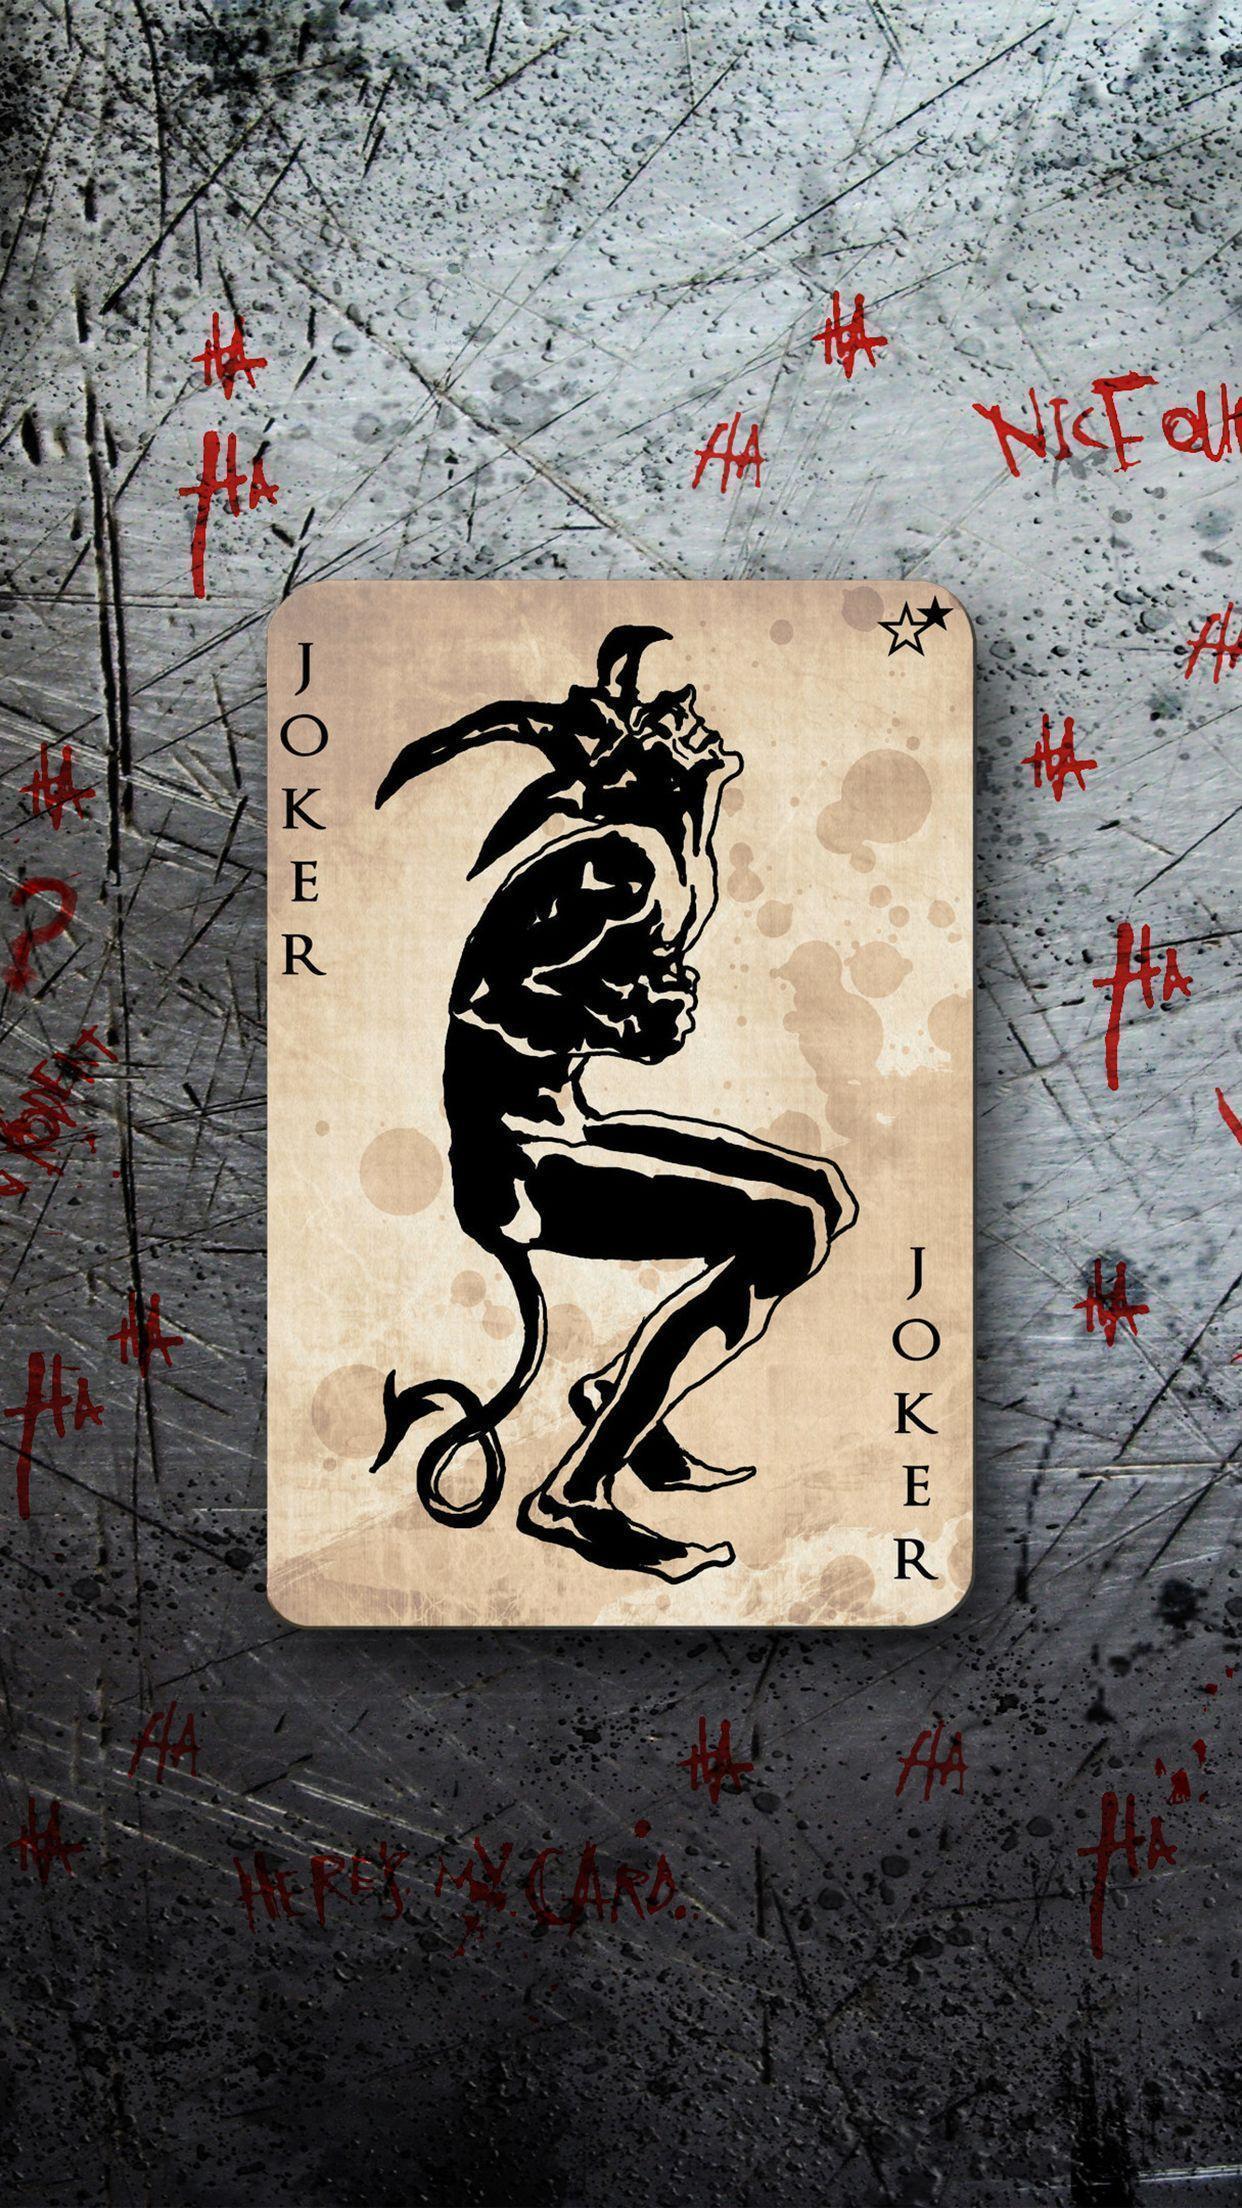 Joker Card Wallpapers - Wallpaper Cave